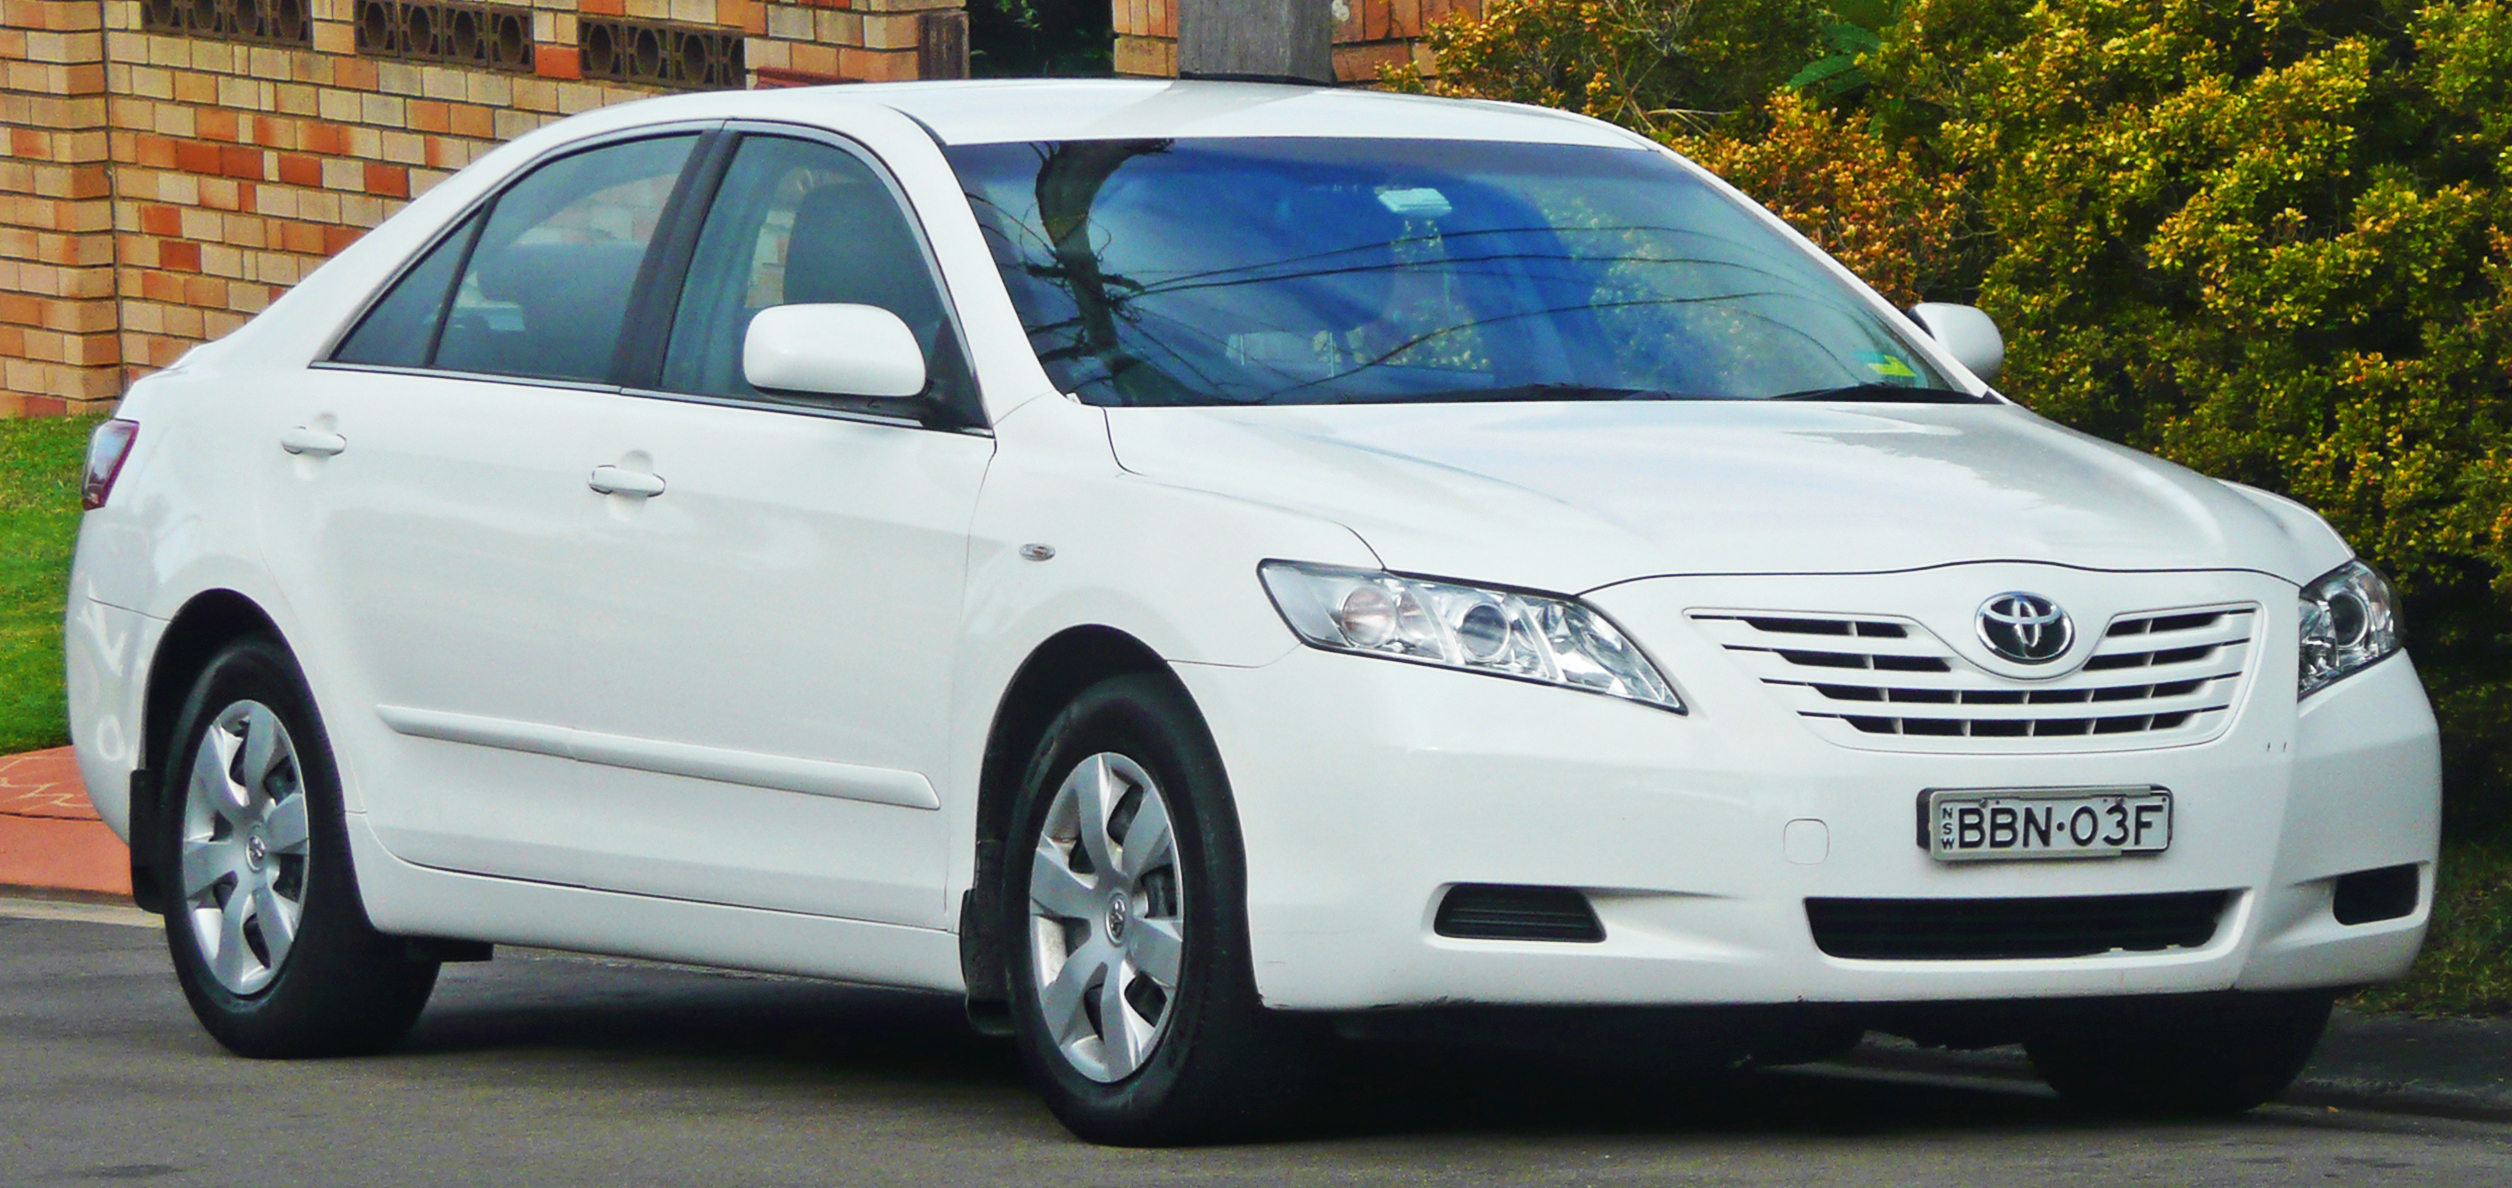 2006-2009_Toyota_Camry_(ACV40R)_Altise_sedan_05.jpg